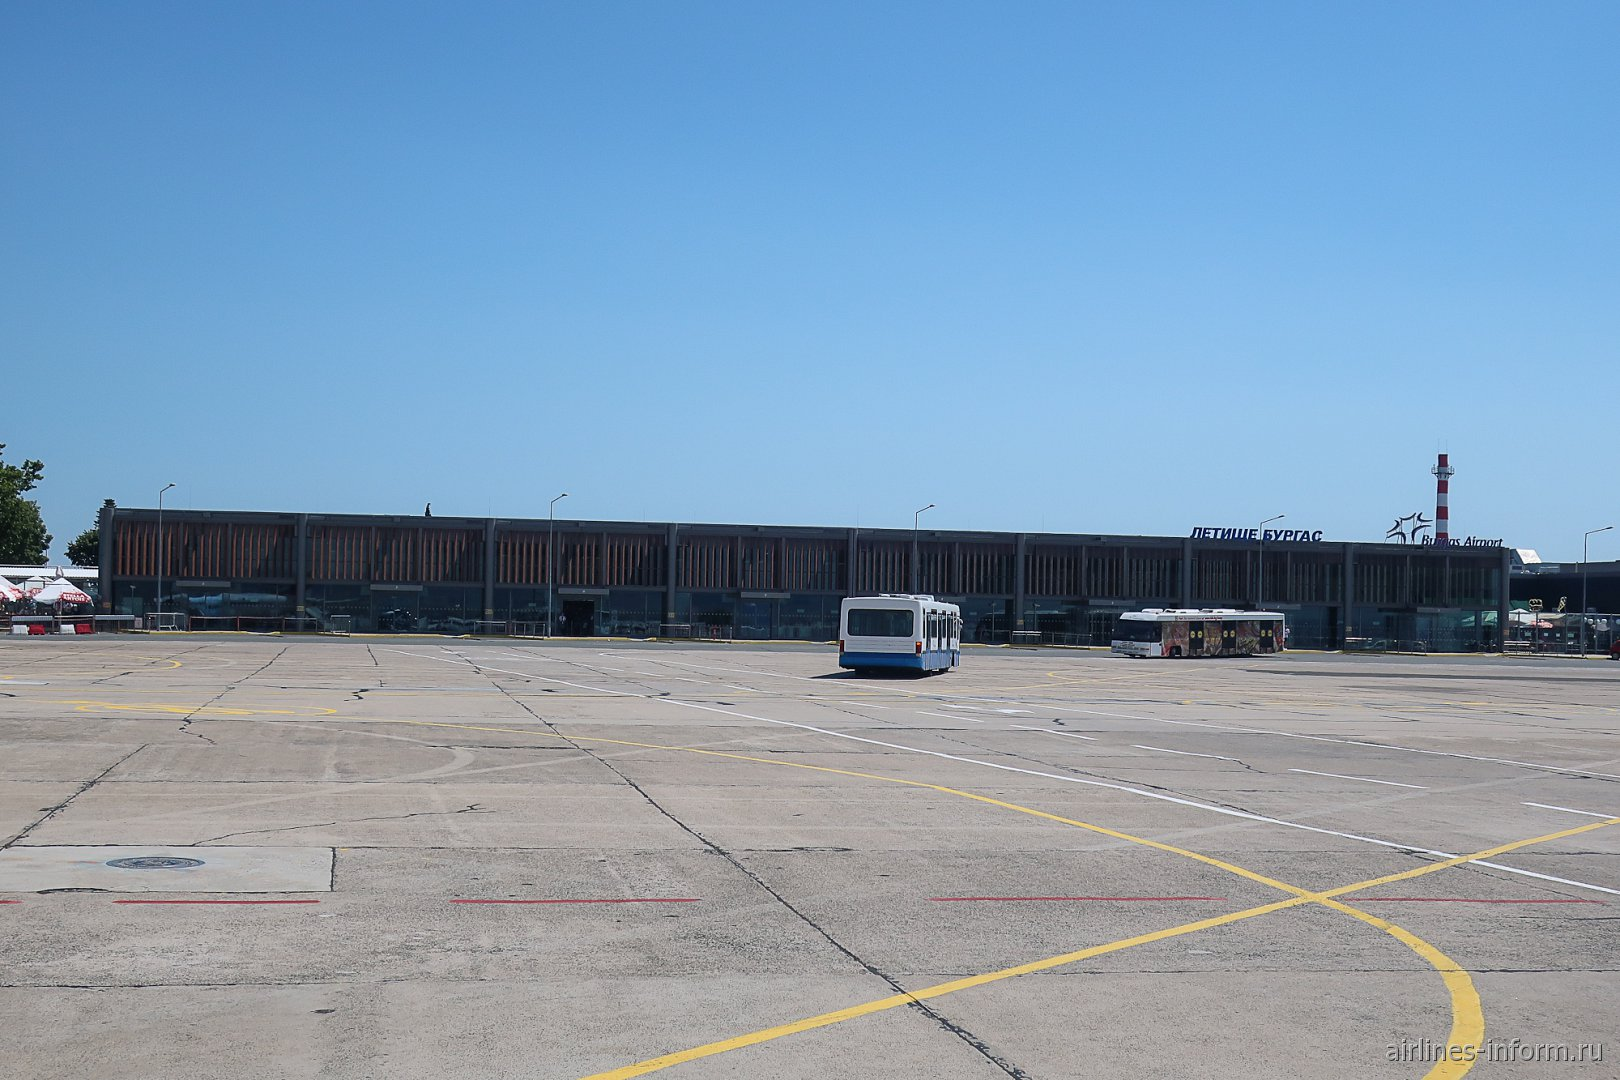 Вид с перрона на пассажирский терминал аэропорта Бургас